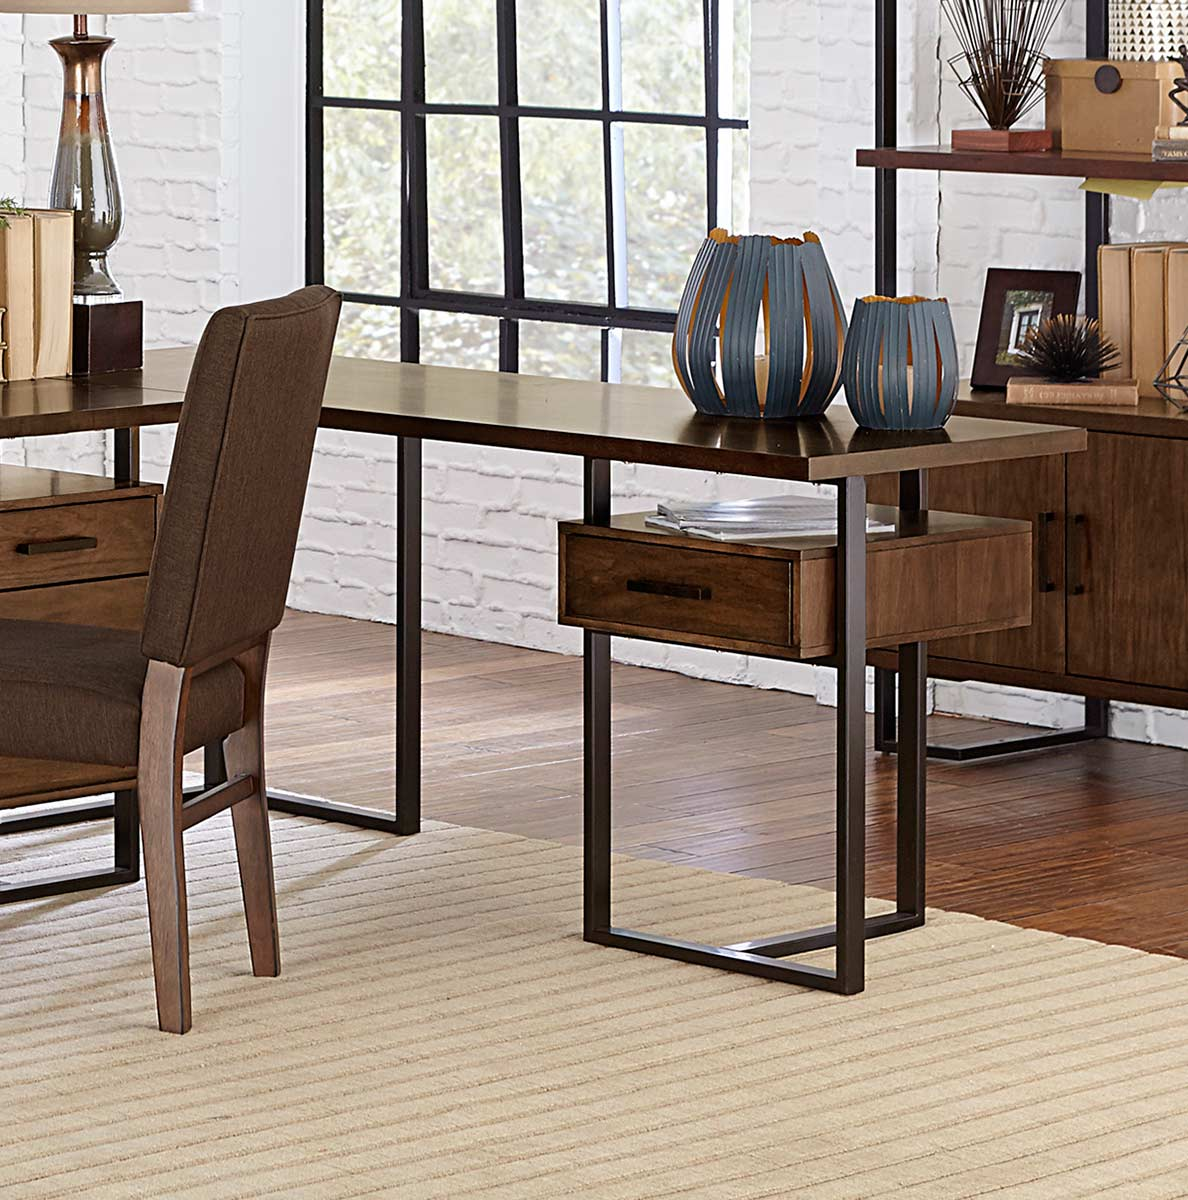 Homelegance Sedley Reversible Return Desk with One Cabinet - Walnut